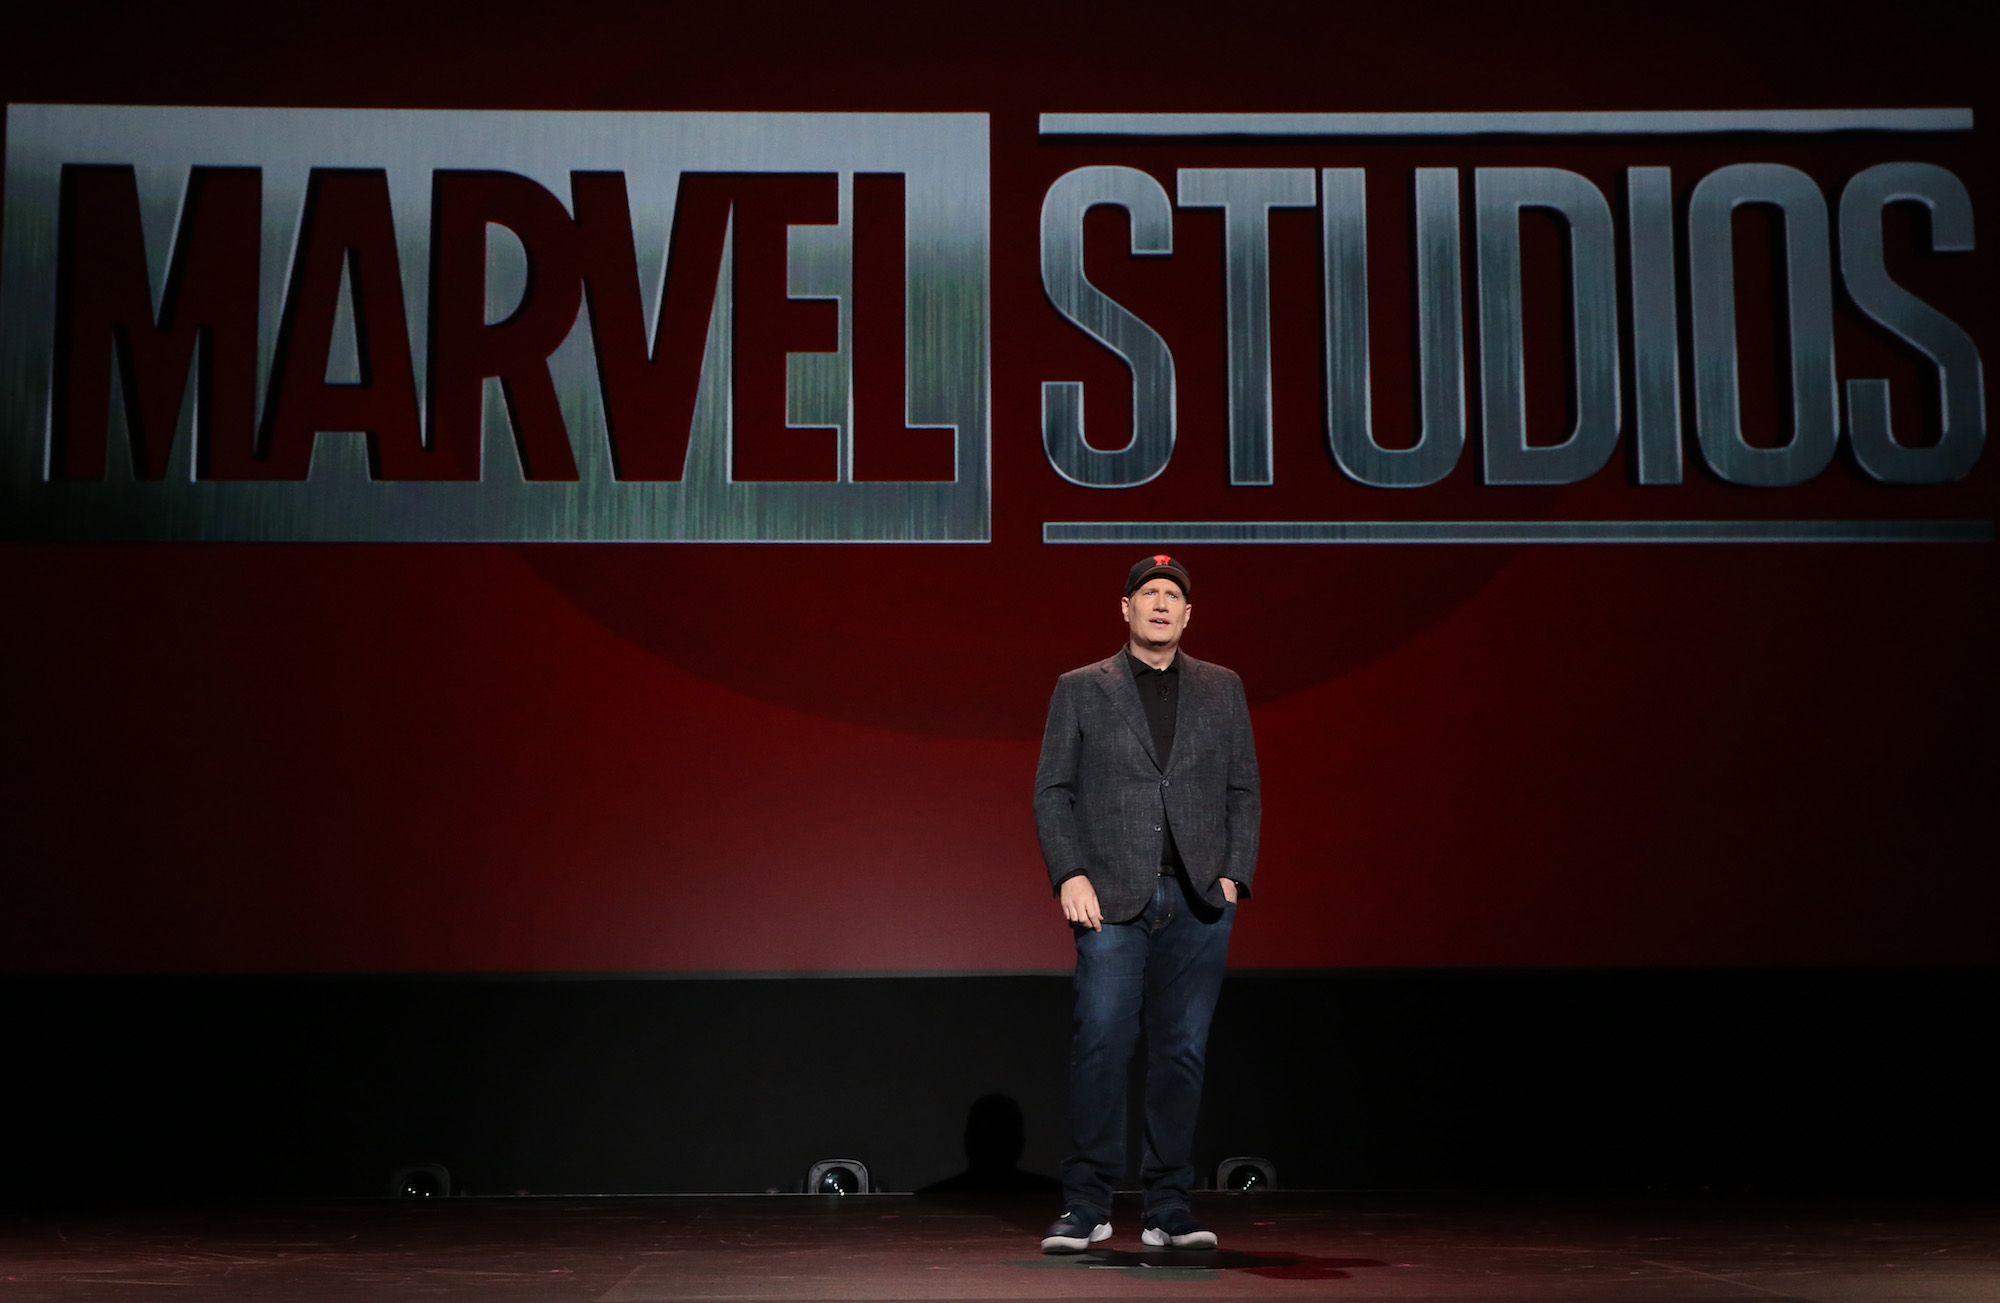 Marvel Nombra a Kevin Feige Director Creativo - Toda Marvel